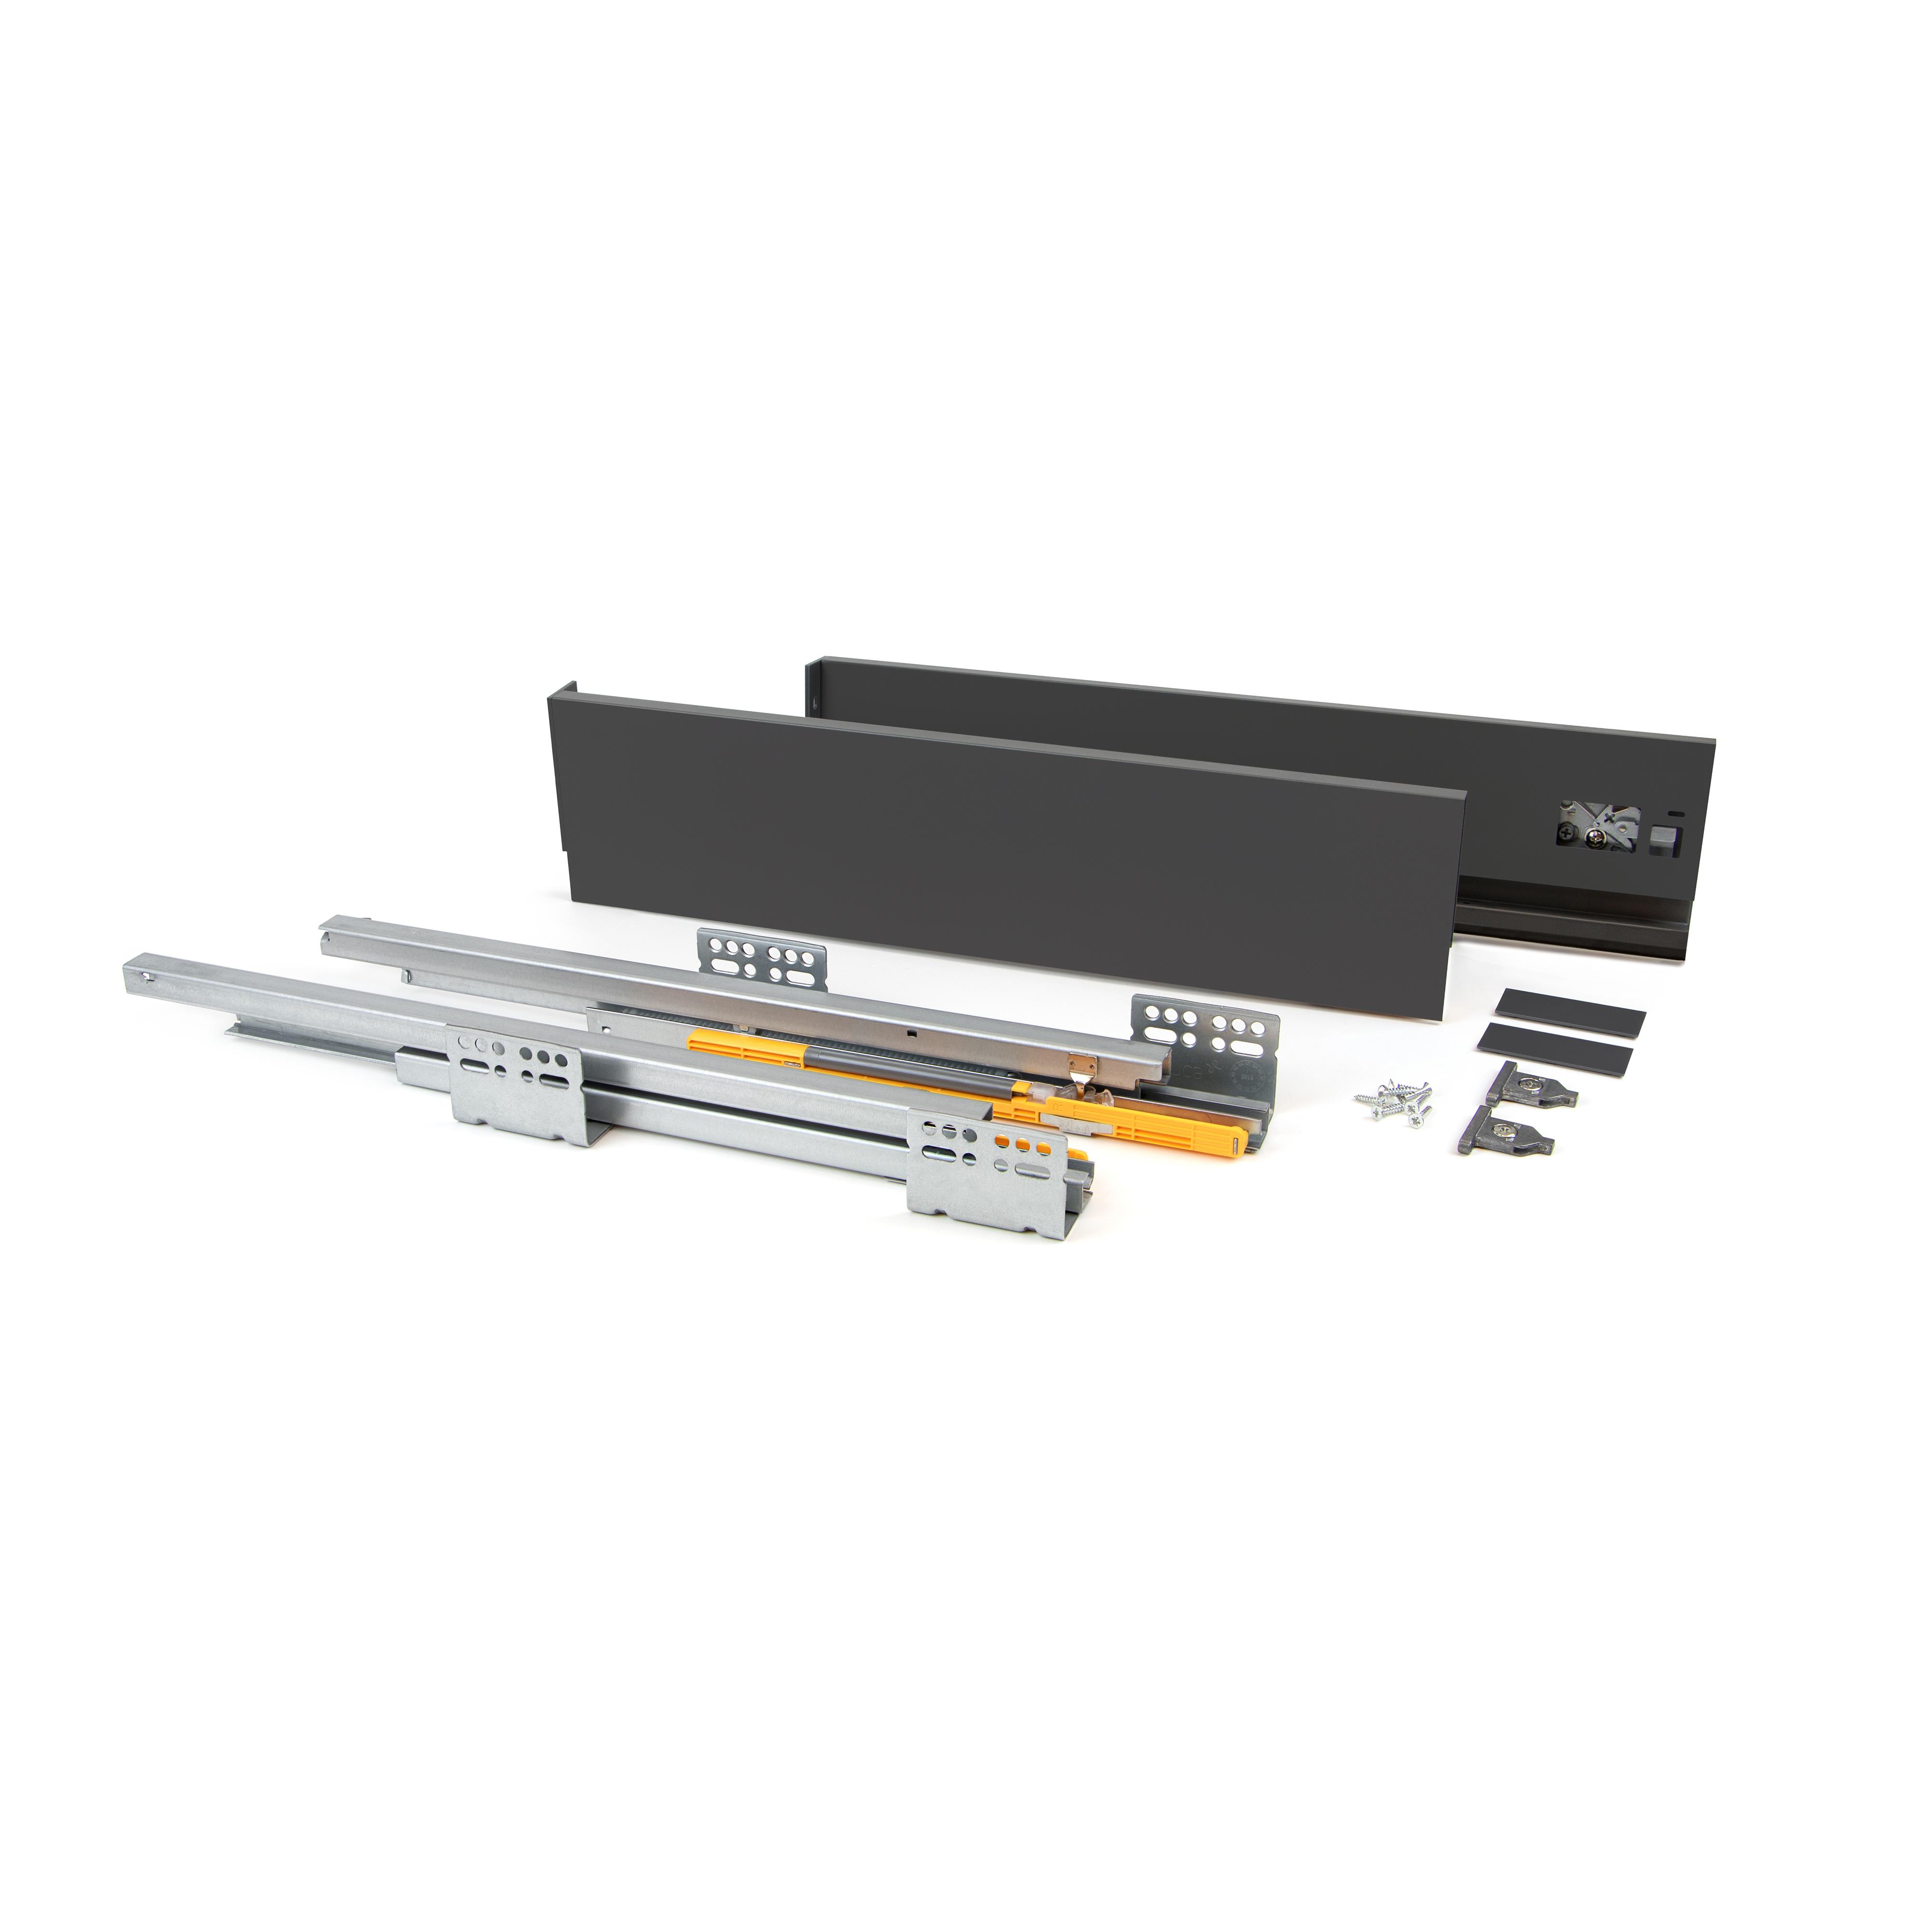 Emuca Kit cassetto per cucina Concept, altezza 138 mm, prof. 400 mm, chiusura soft, Acciaio, Grigio antracite